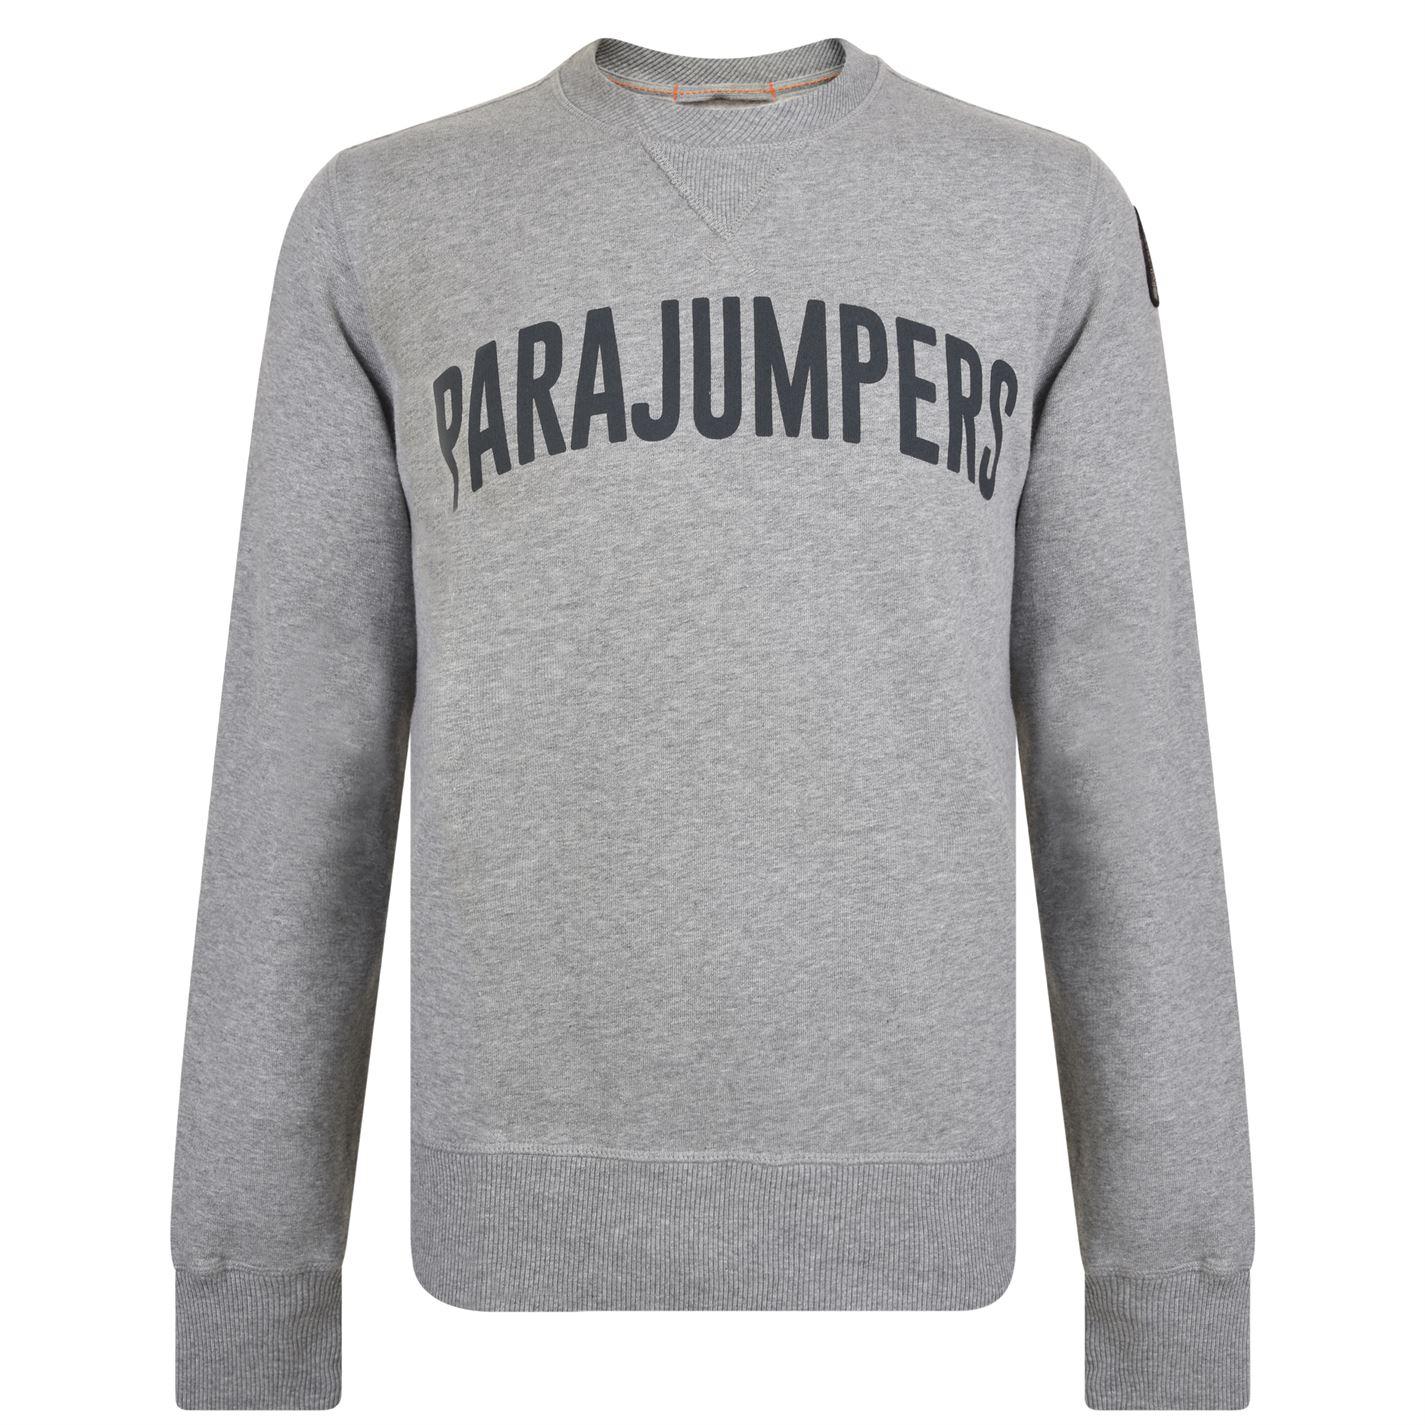 PARAJUMPERS Caleb Crew Sweatshirt - Glami.hu 7fe8dc0cd5